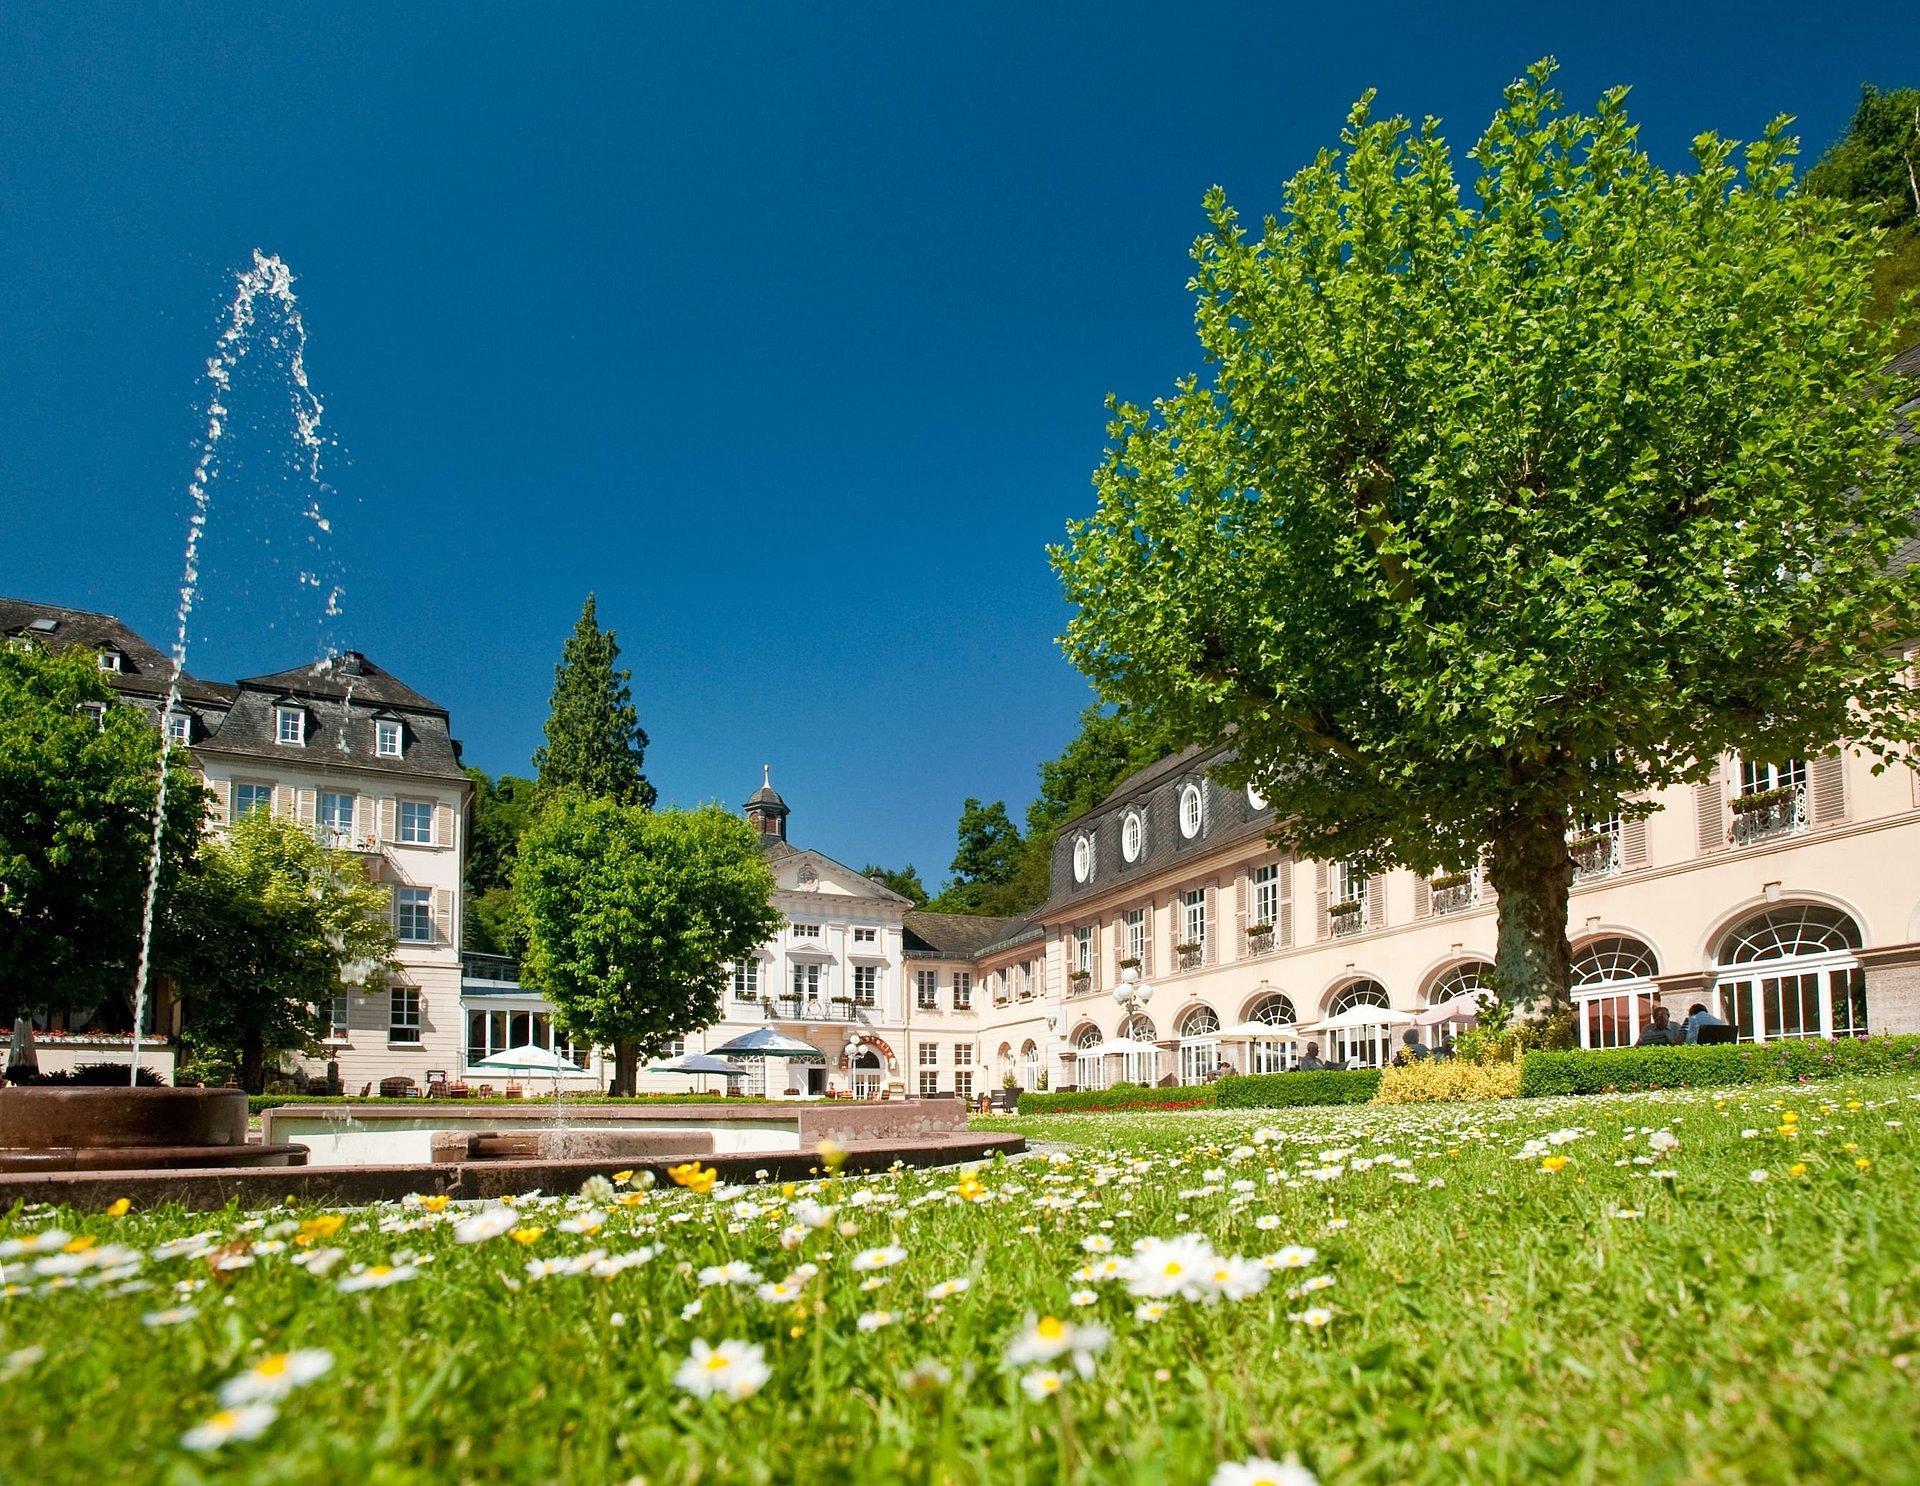 Kurgarten Bad Bertrich, Eifel